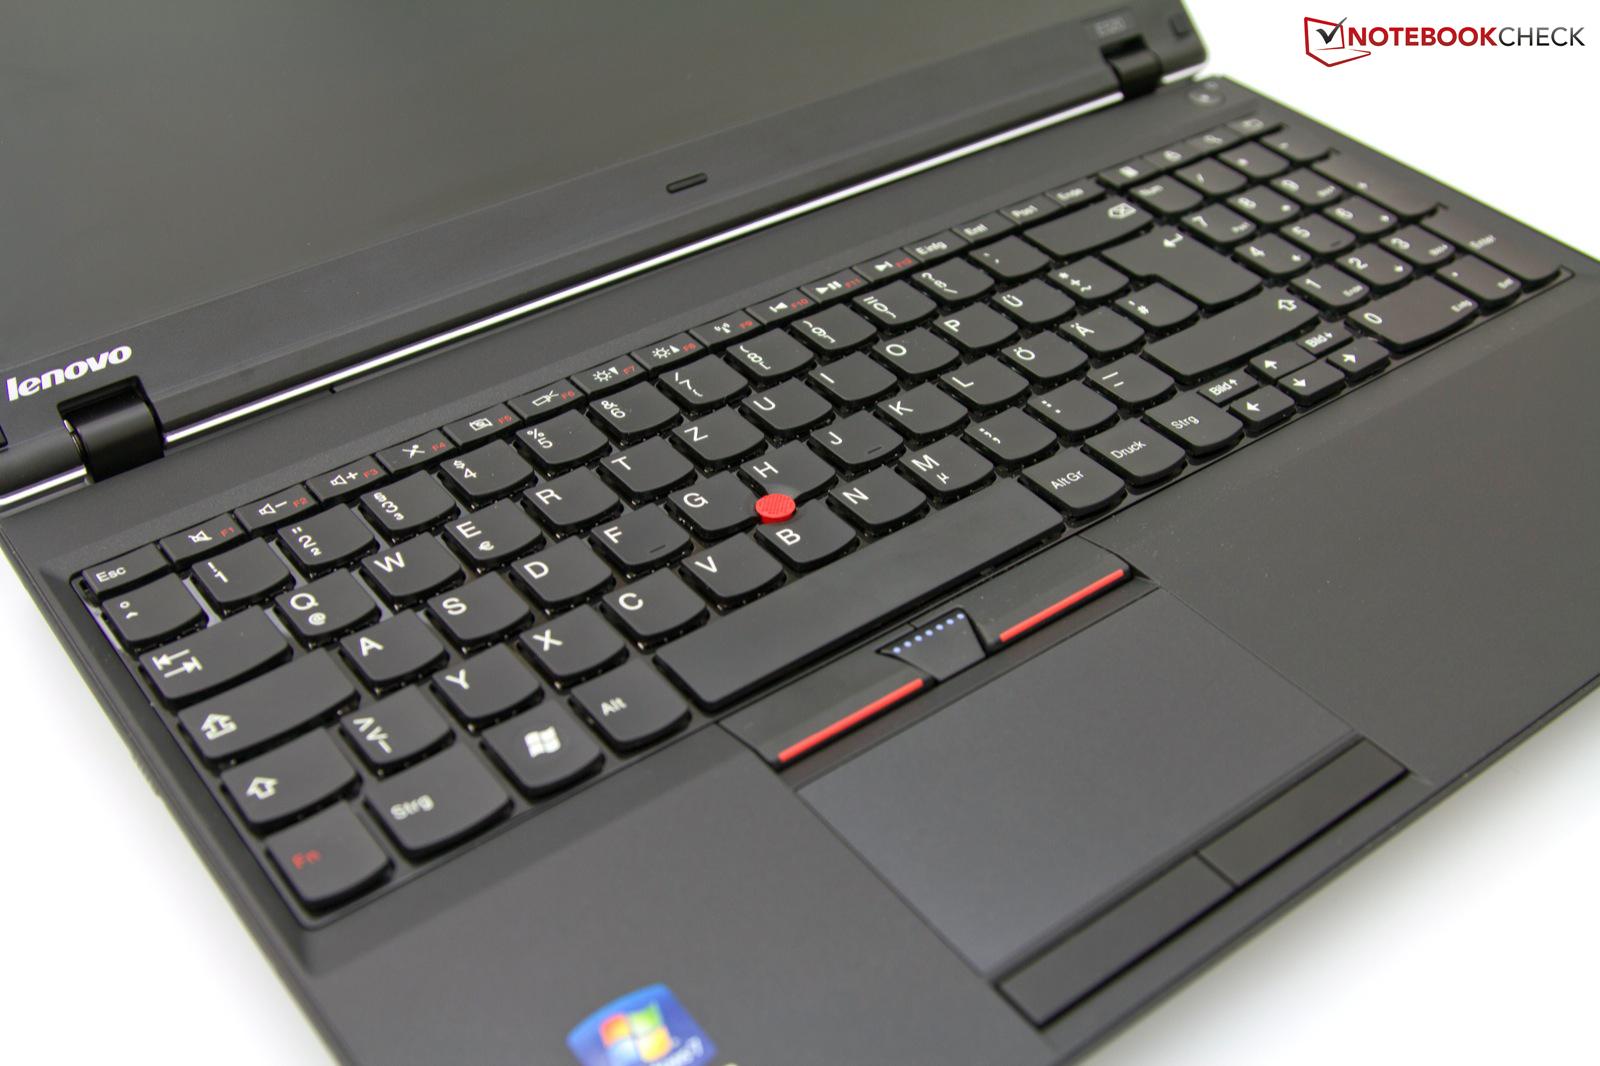 Driver: Lenovo ThinkPad Edge E520